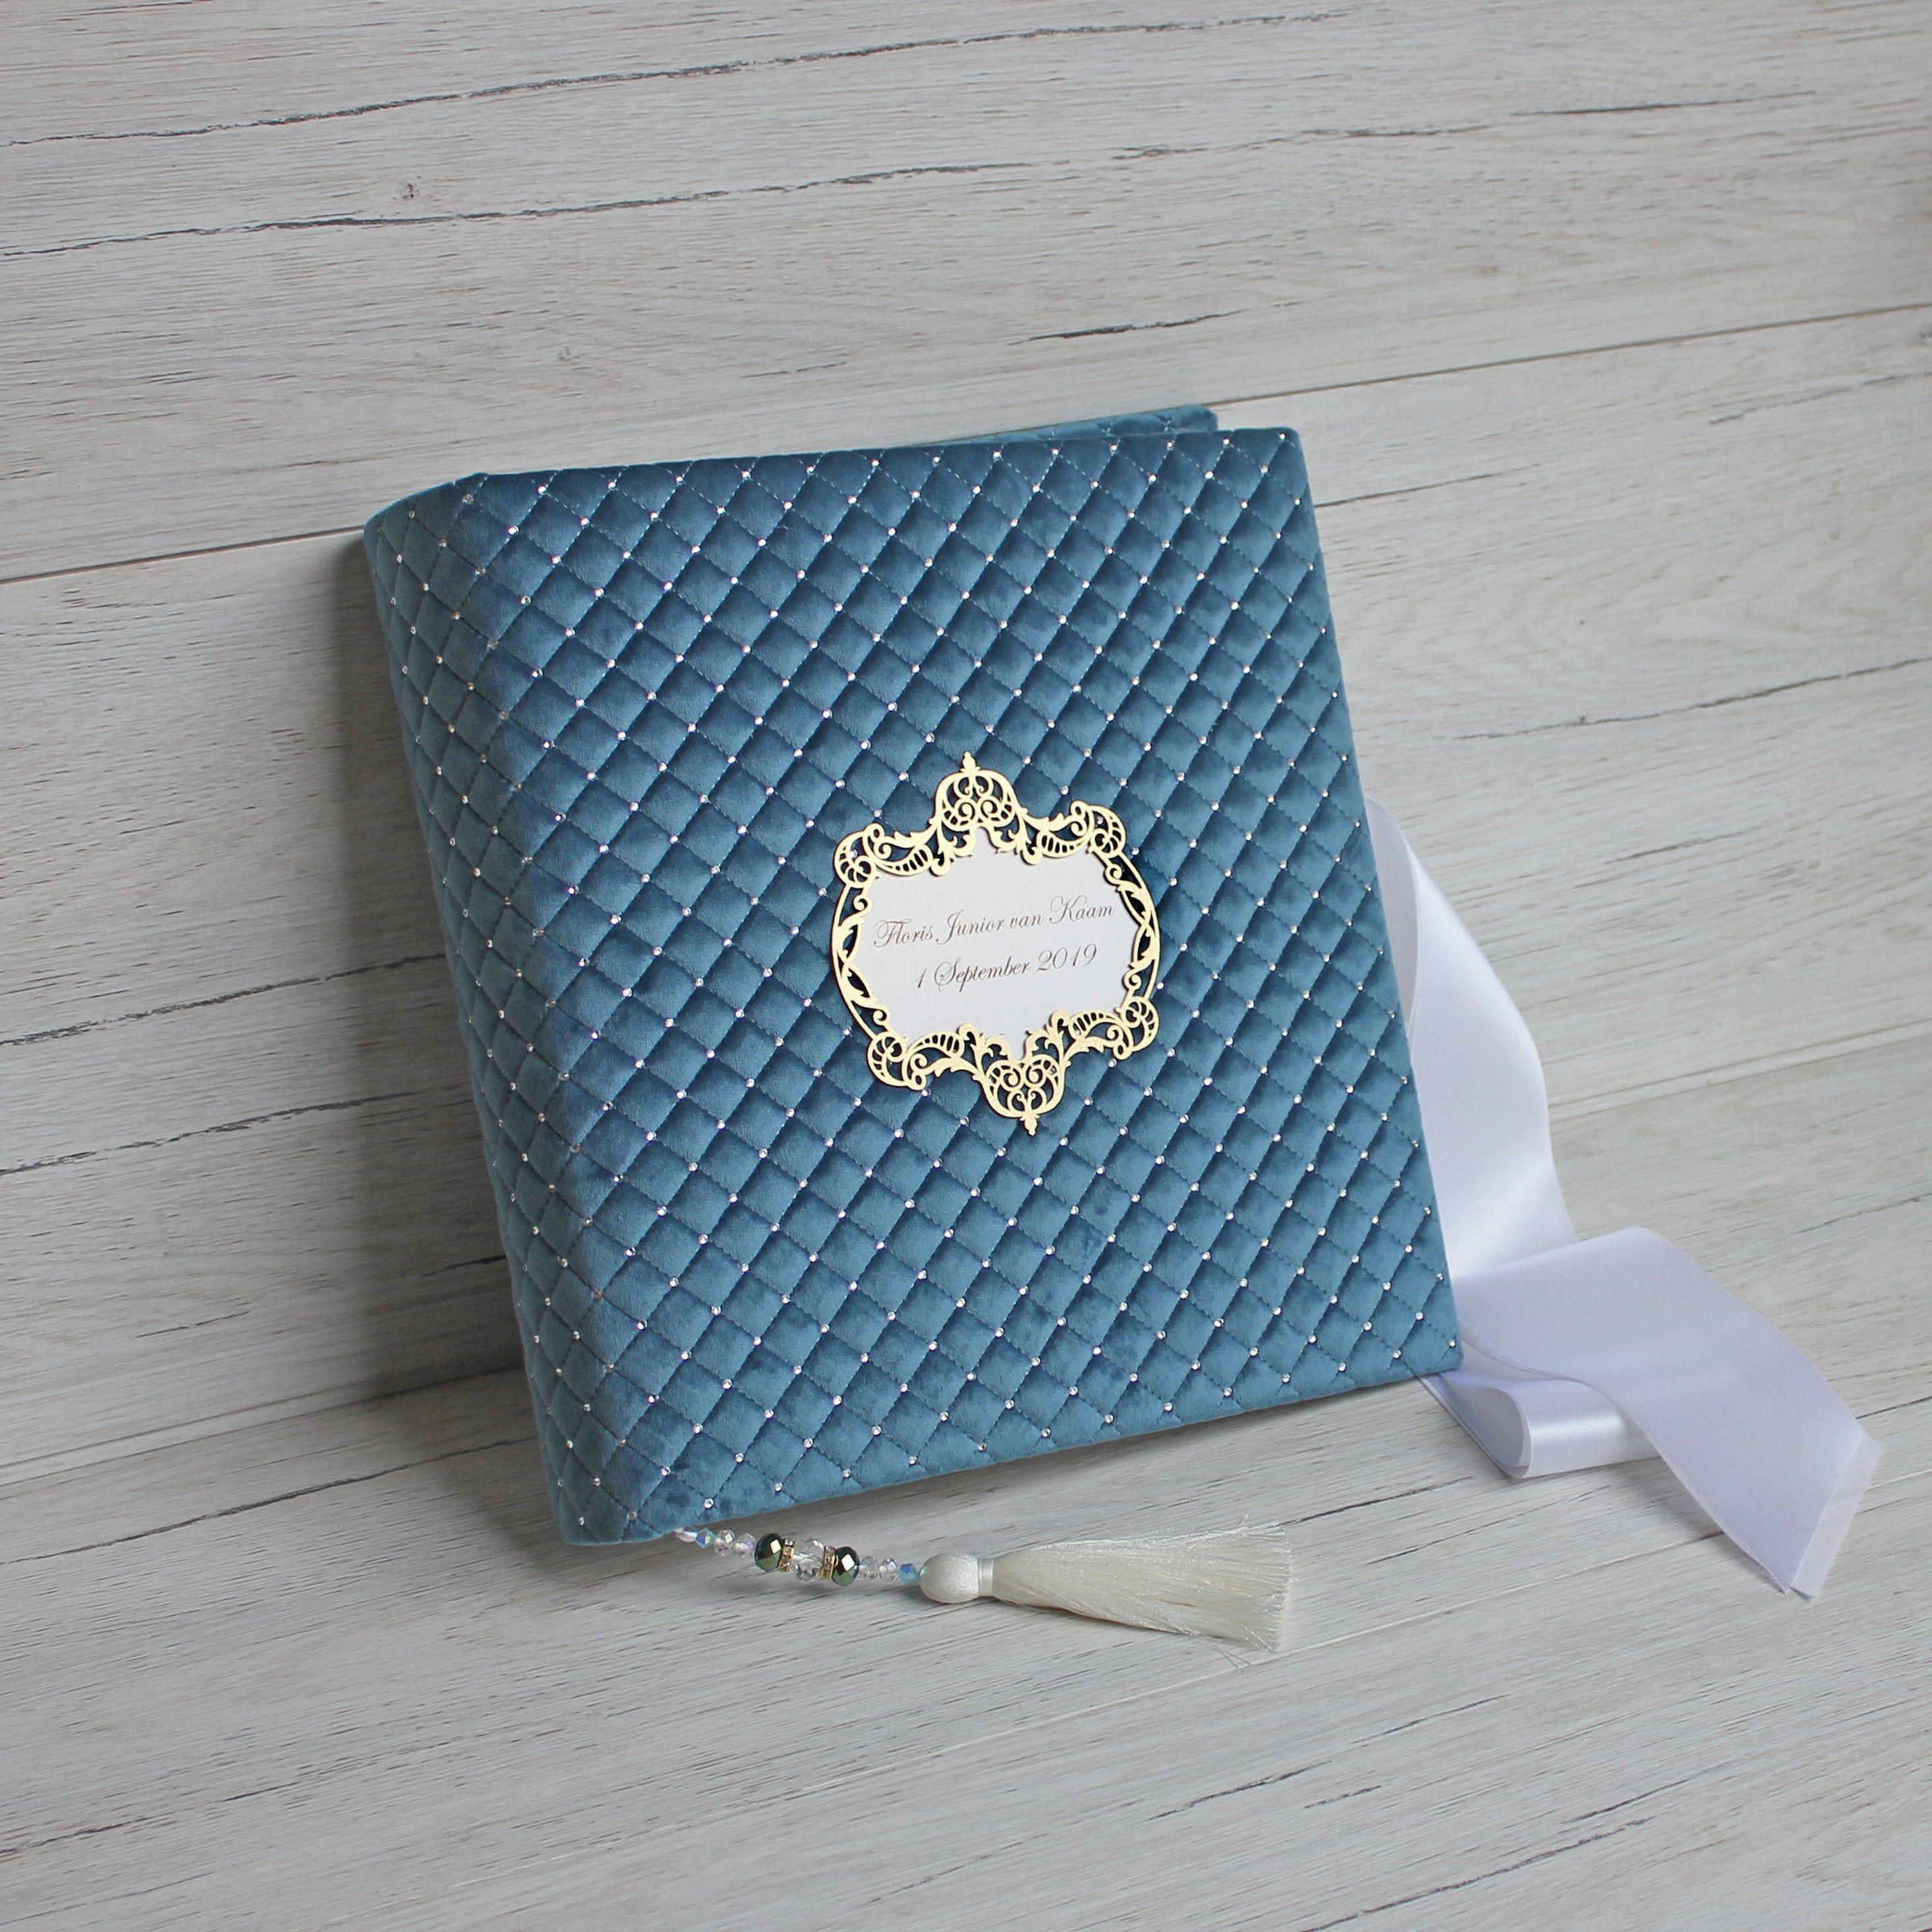 Azure blue wedding album for photos custom wedding guest